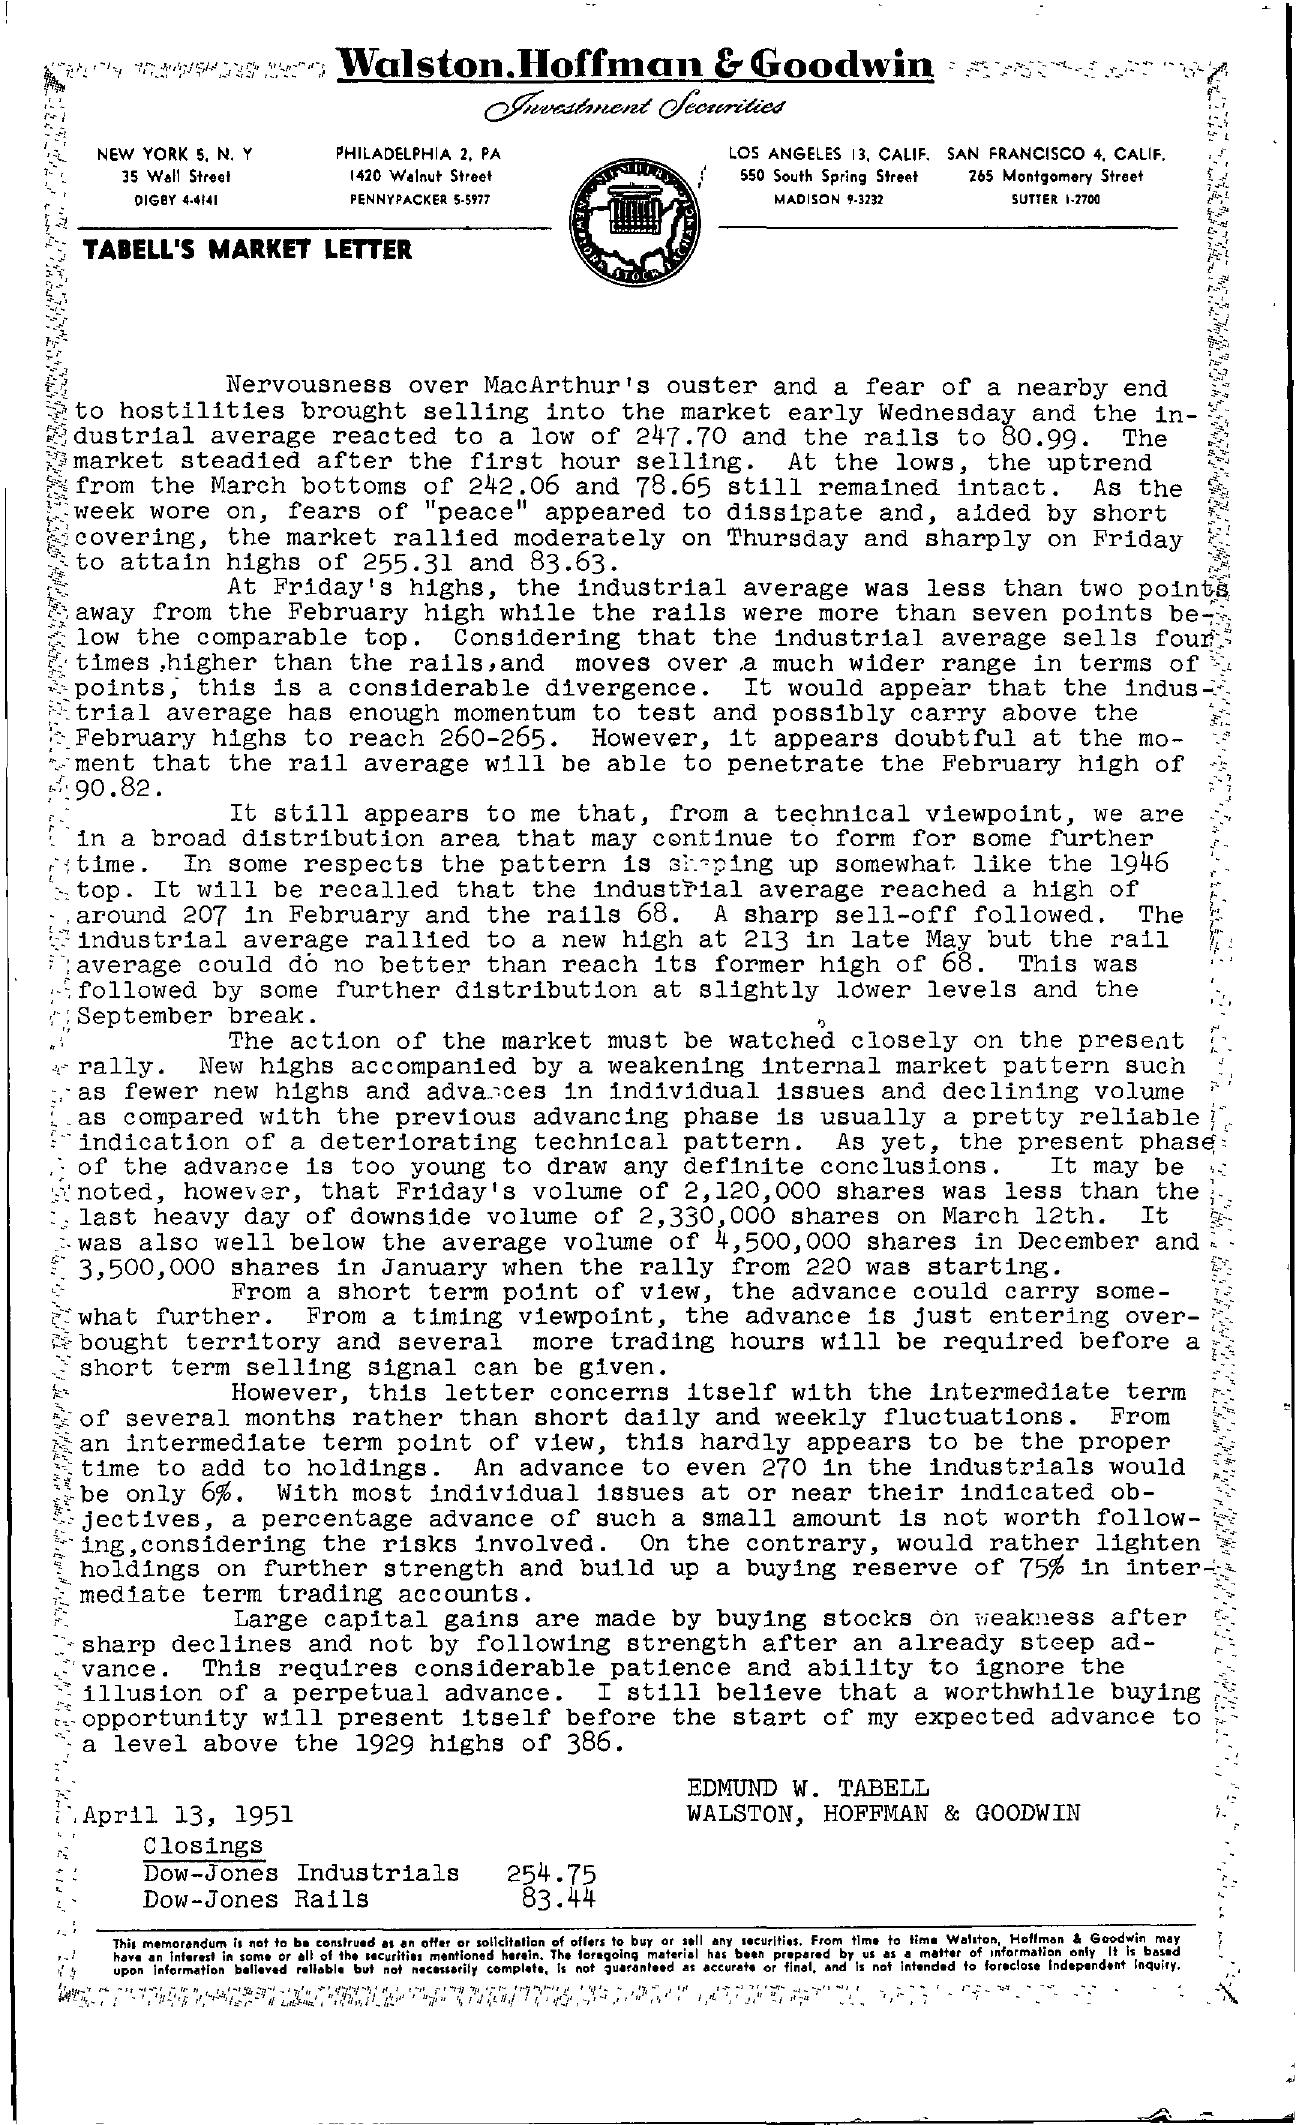 Tabell's Market Letter - April 13, 1951